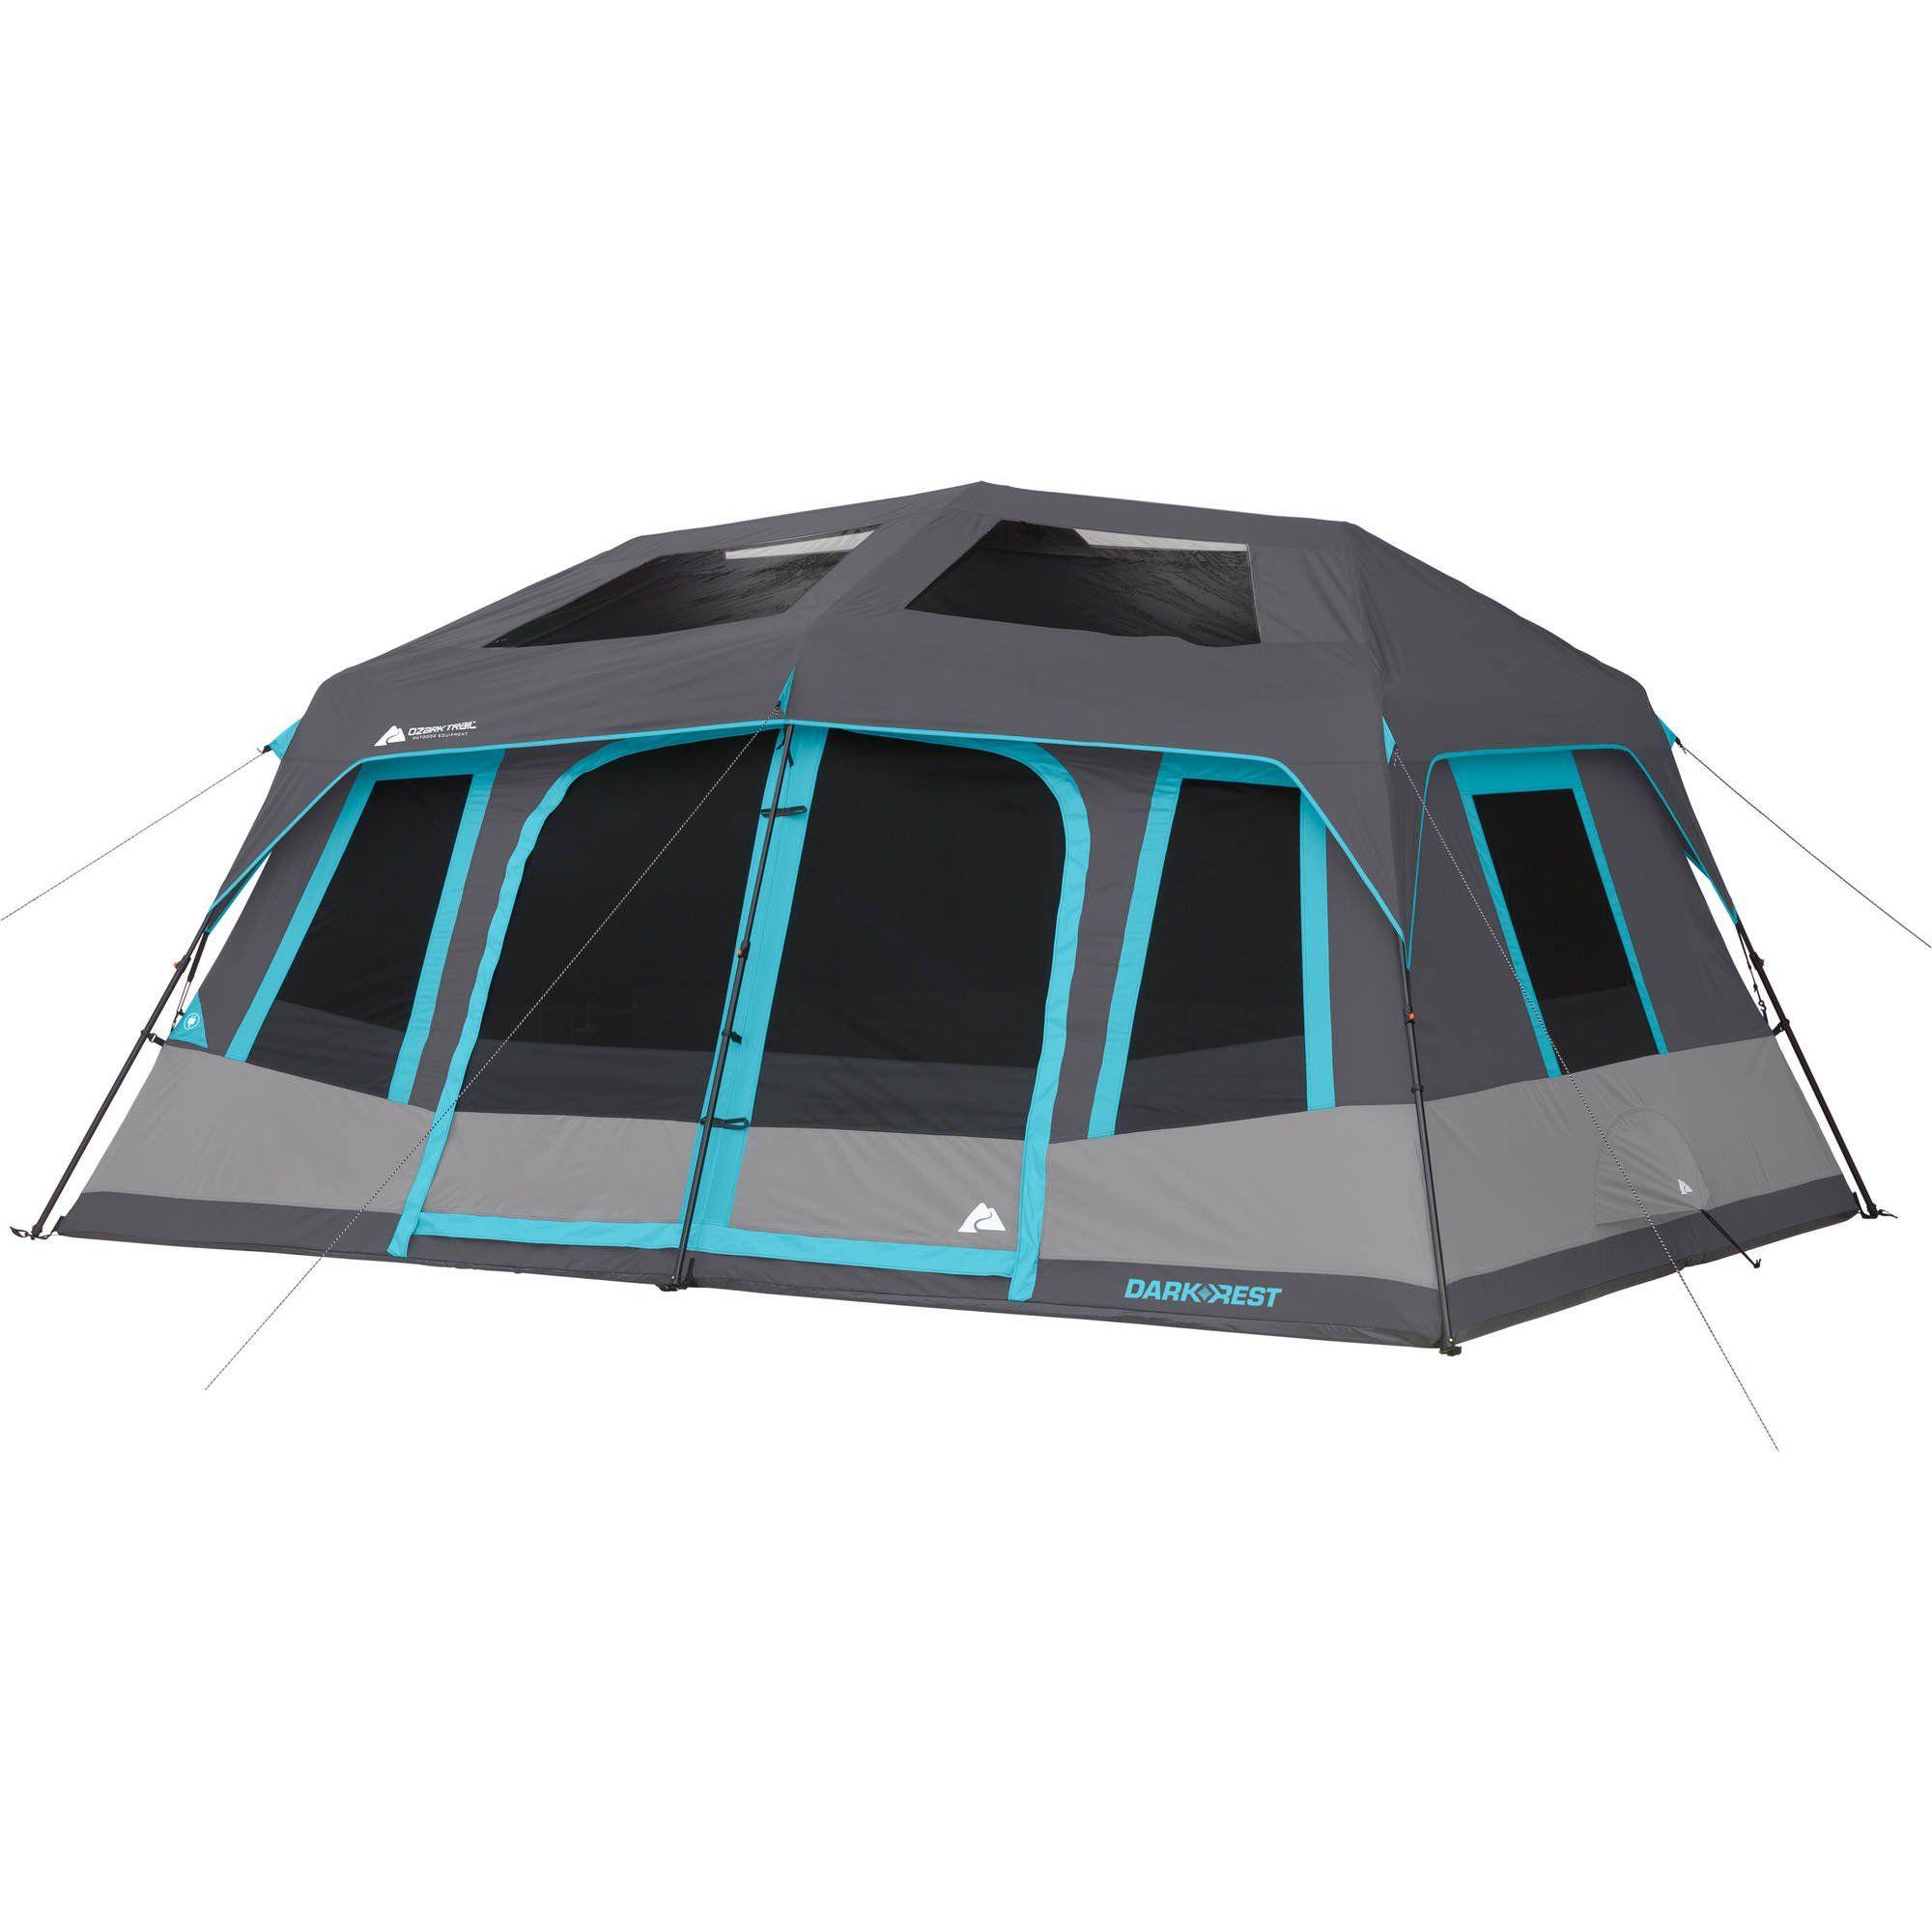 Ozark Trail 10 Person Dark Rest Instant Cabin Tent Walmart Com Cabin Tent 10 Person Tent Tent